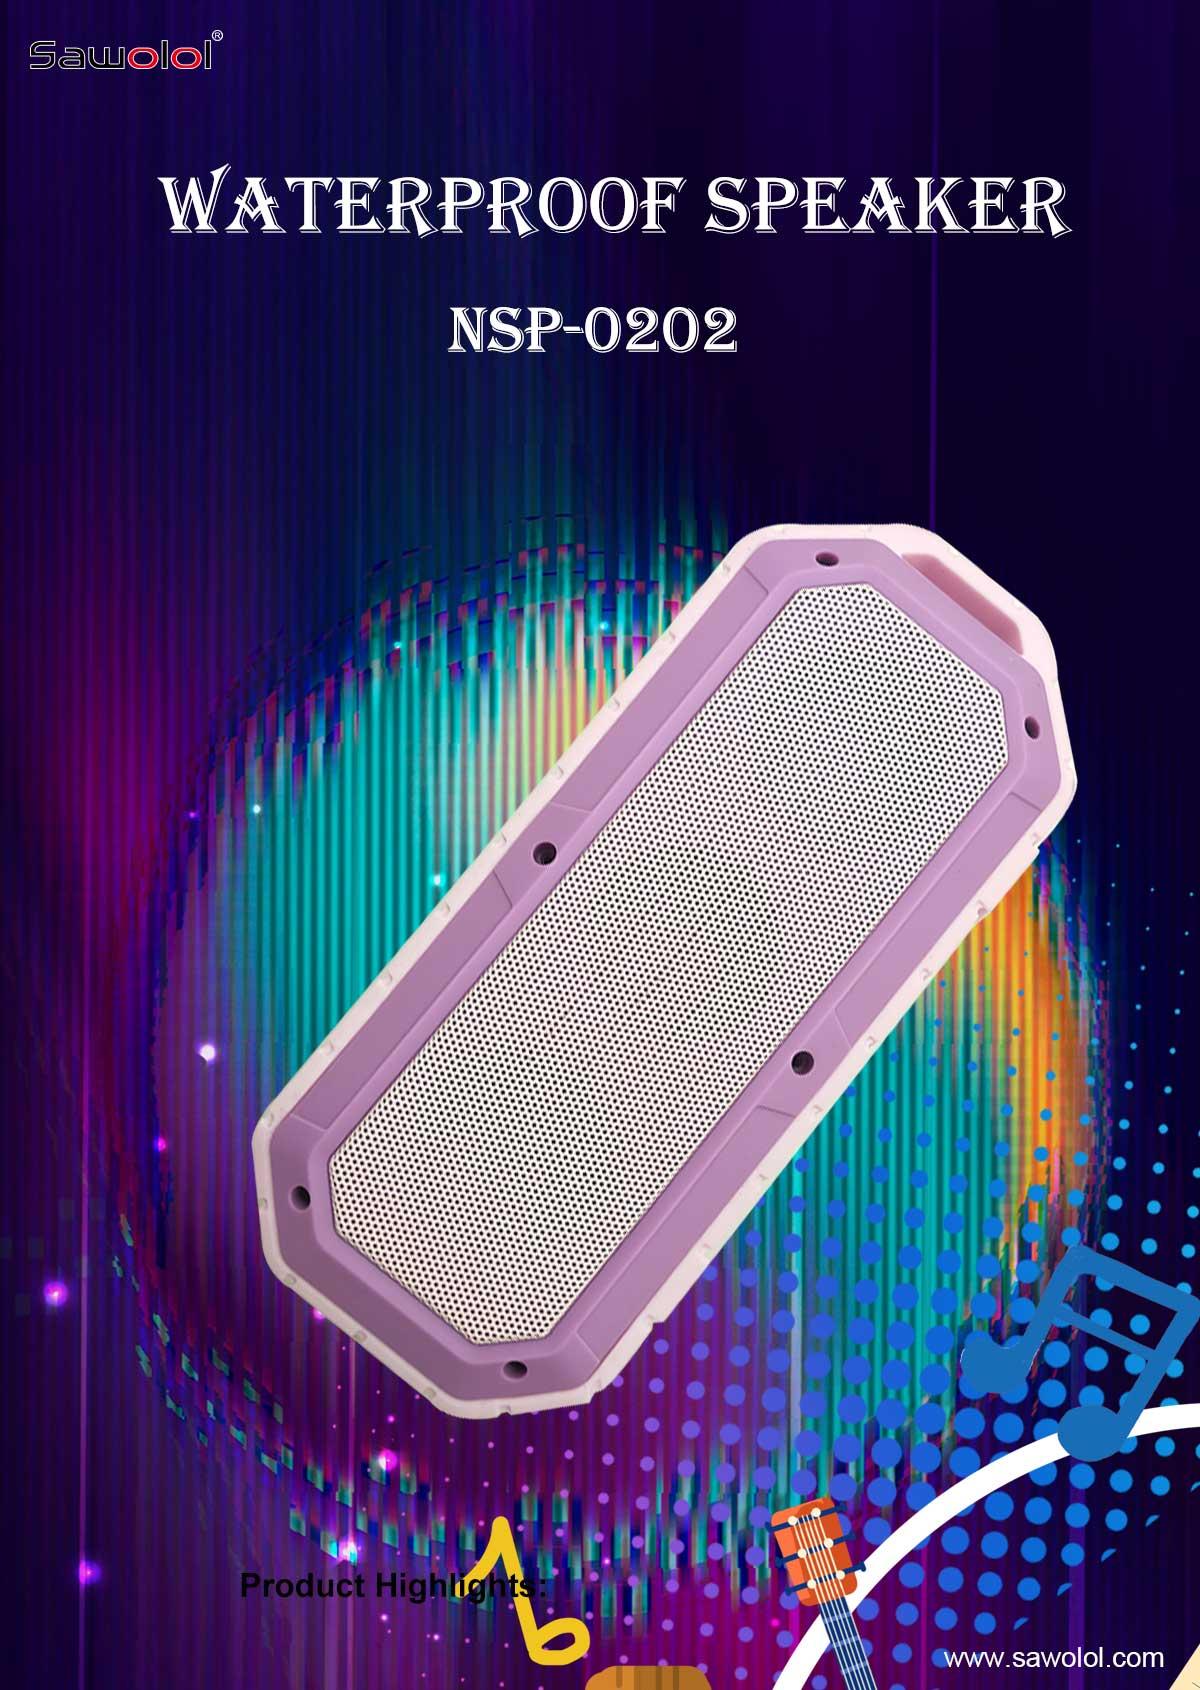 Waterproof speaker for shower